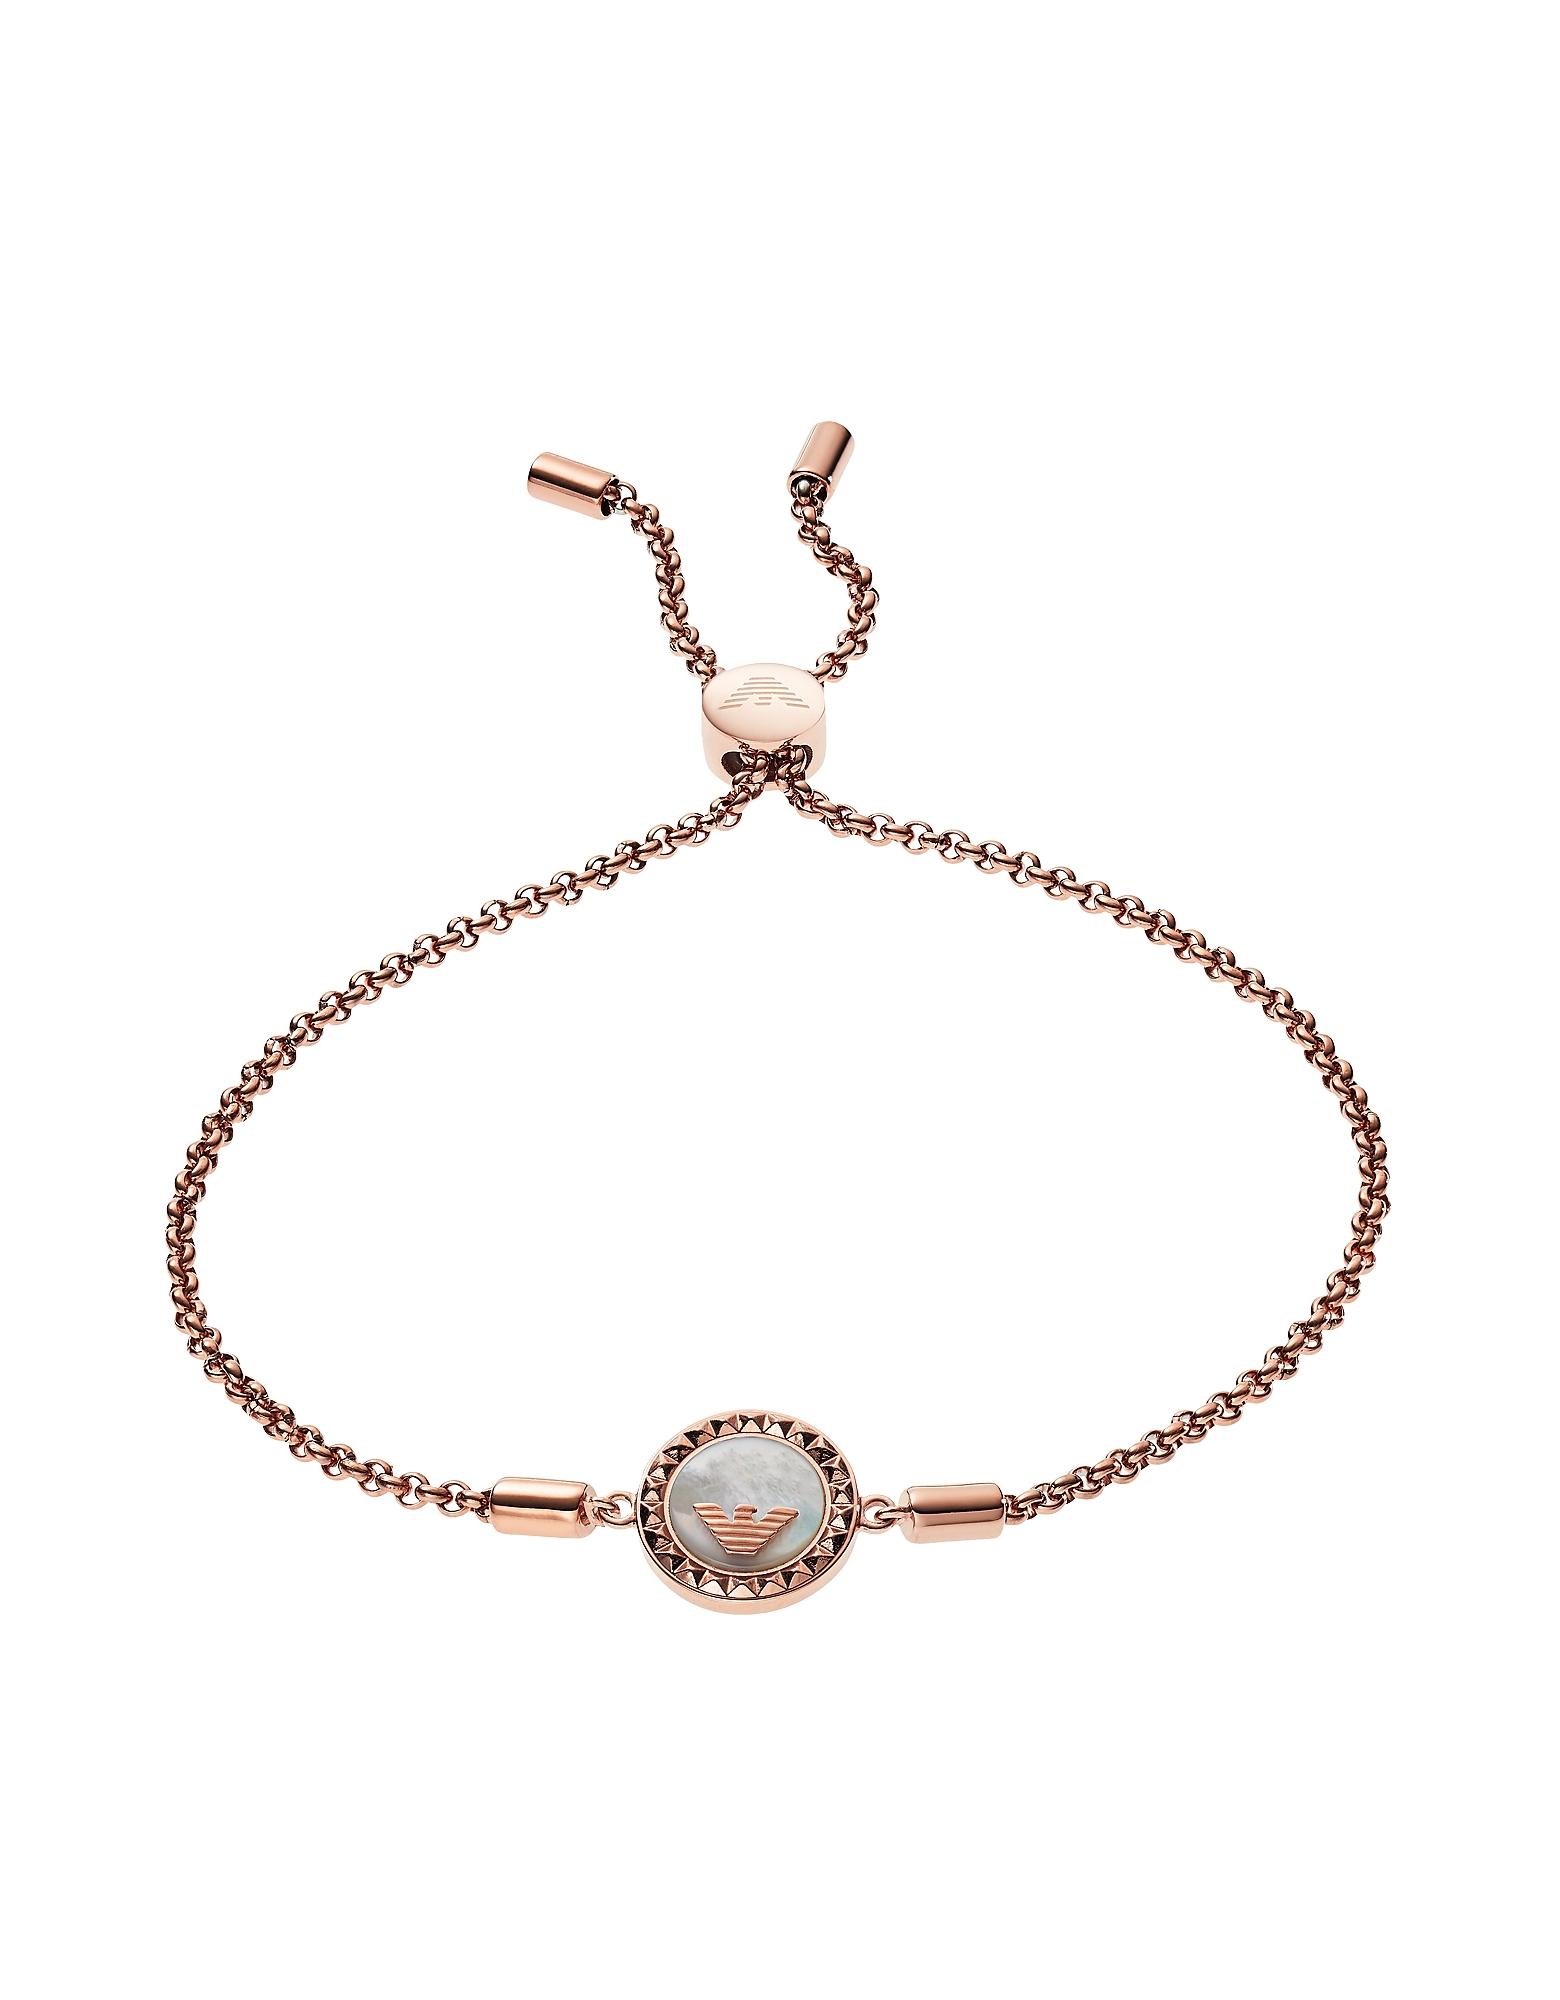 Emporio Armani Bracelets, Rose Gold Plated Sterling Silver W/Logo Charm Women's Bracelet